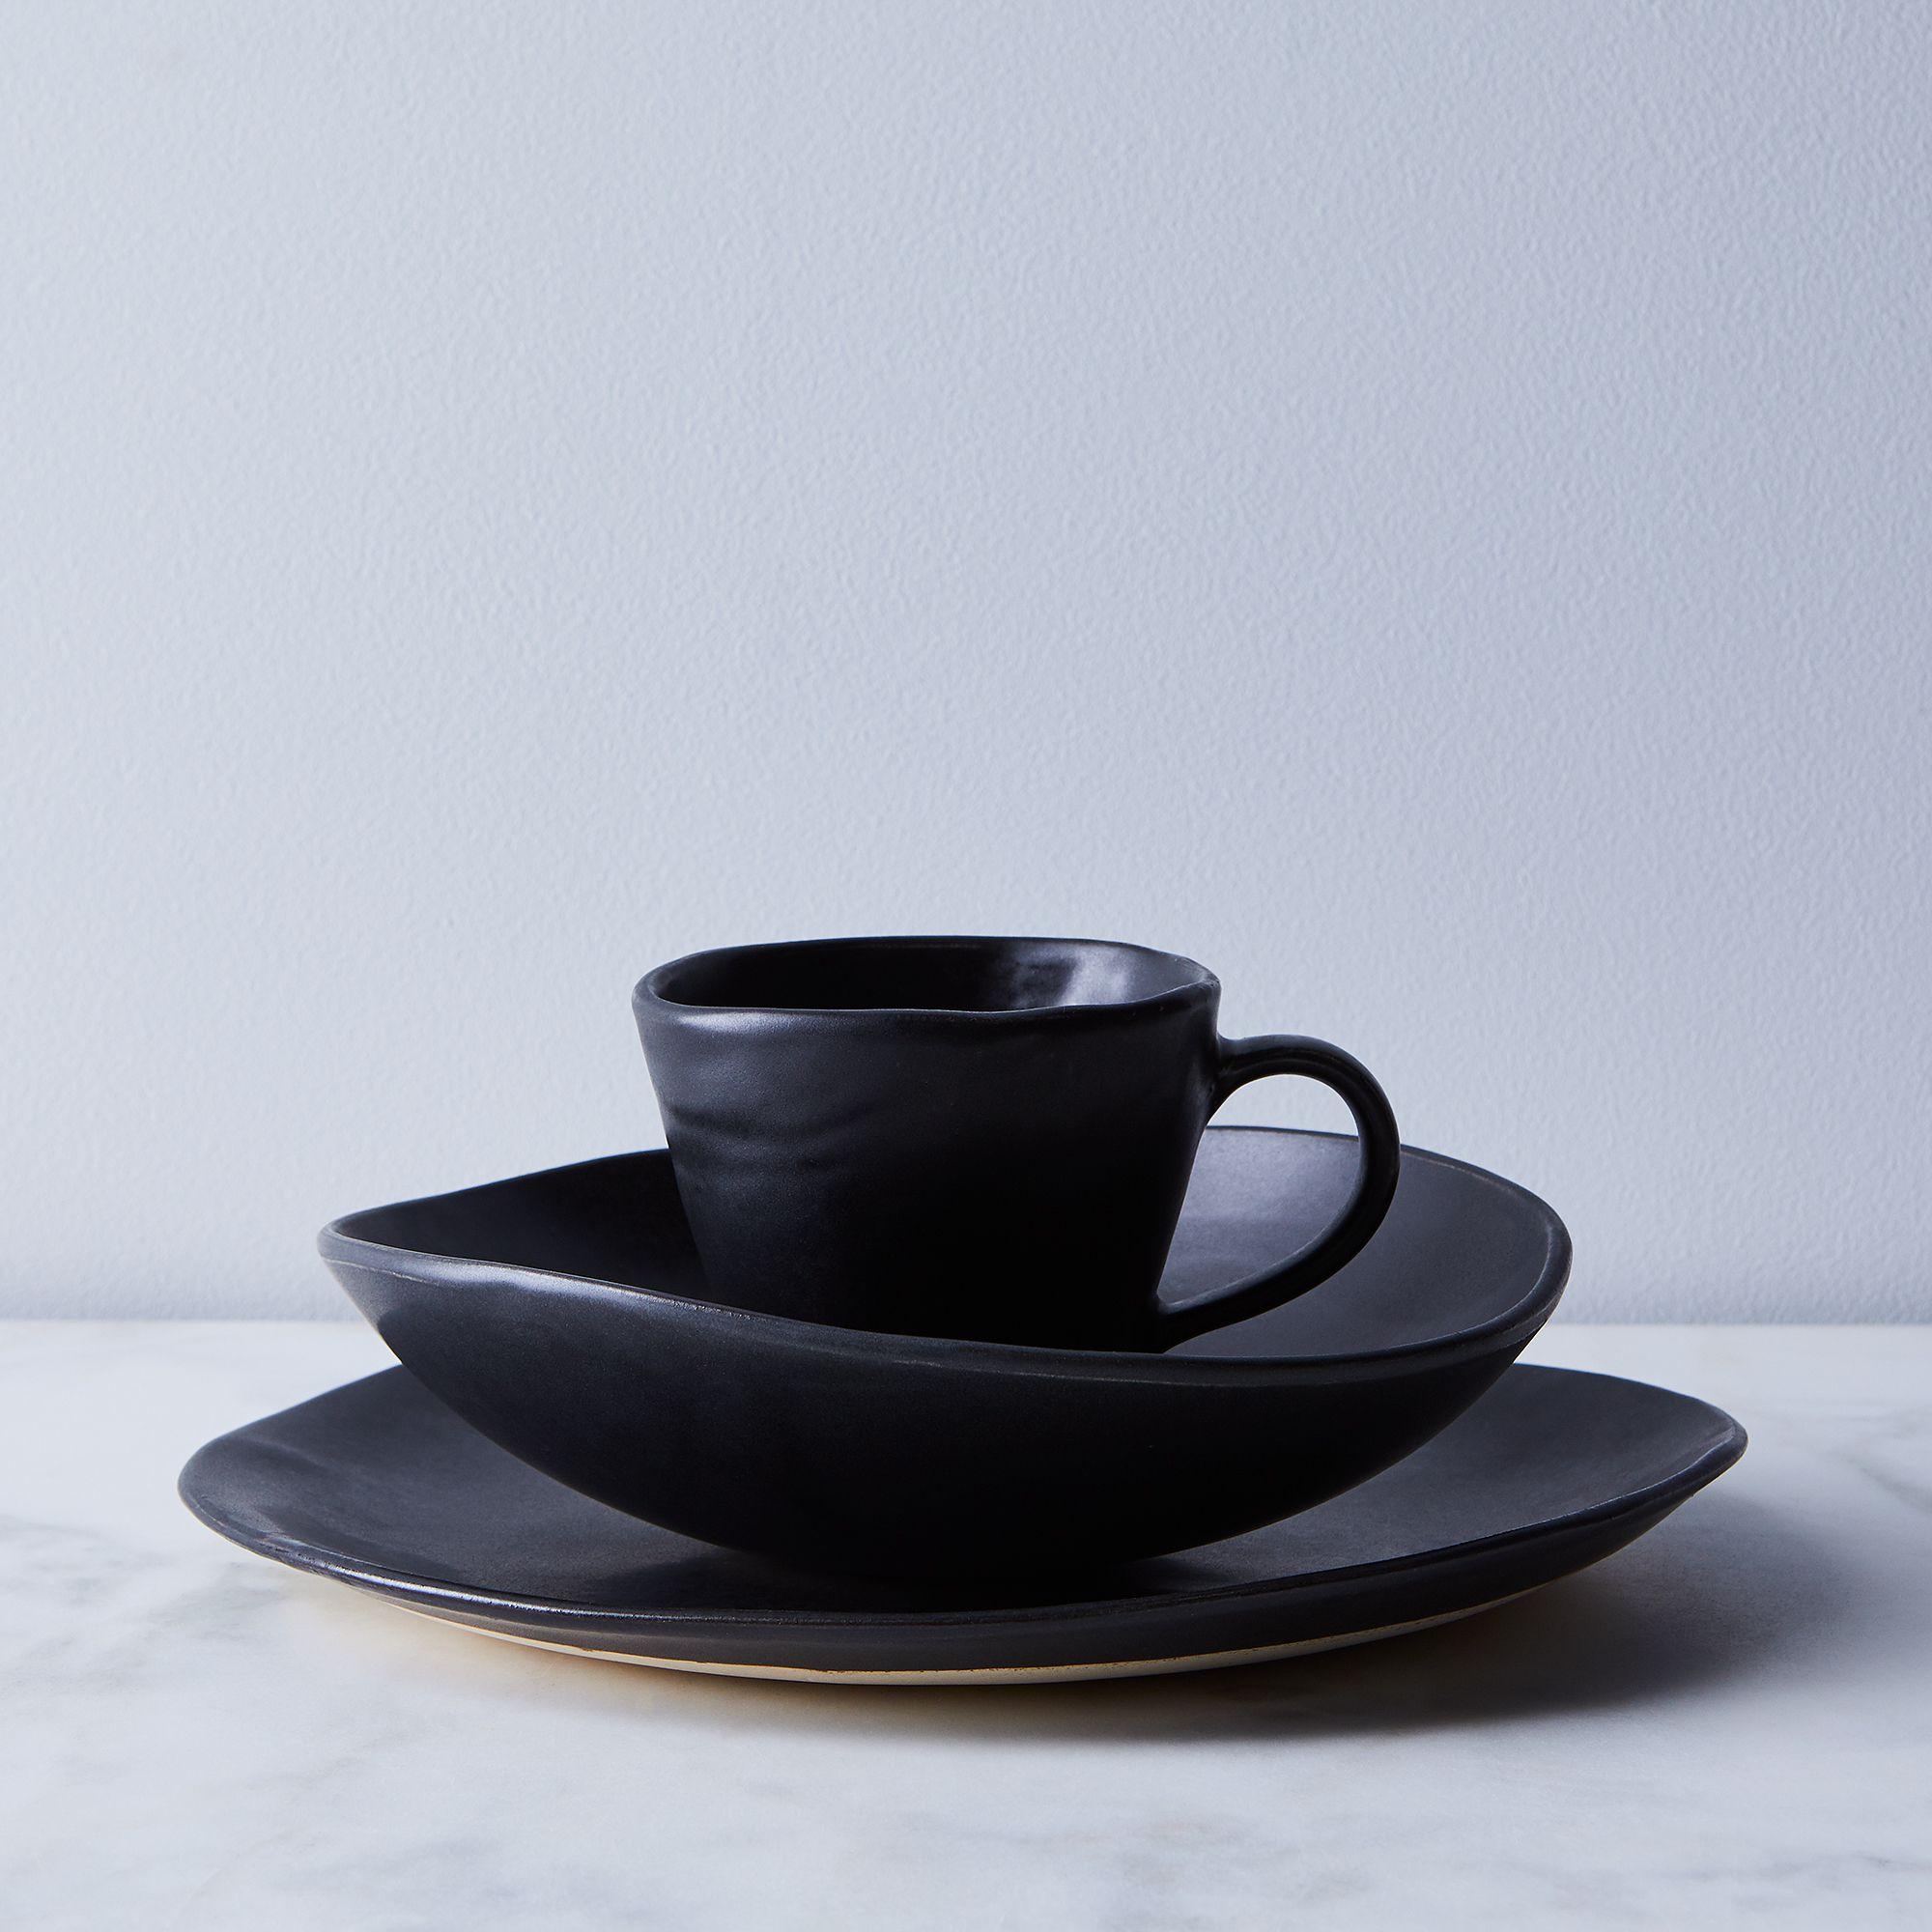 Handmade Wabi Sabi Ceramic Dinnerware Black, 3-piece Set